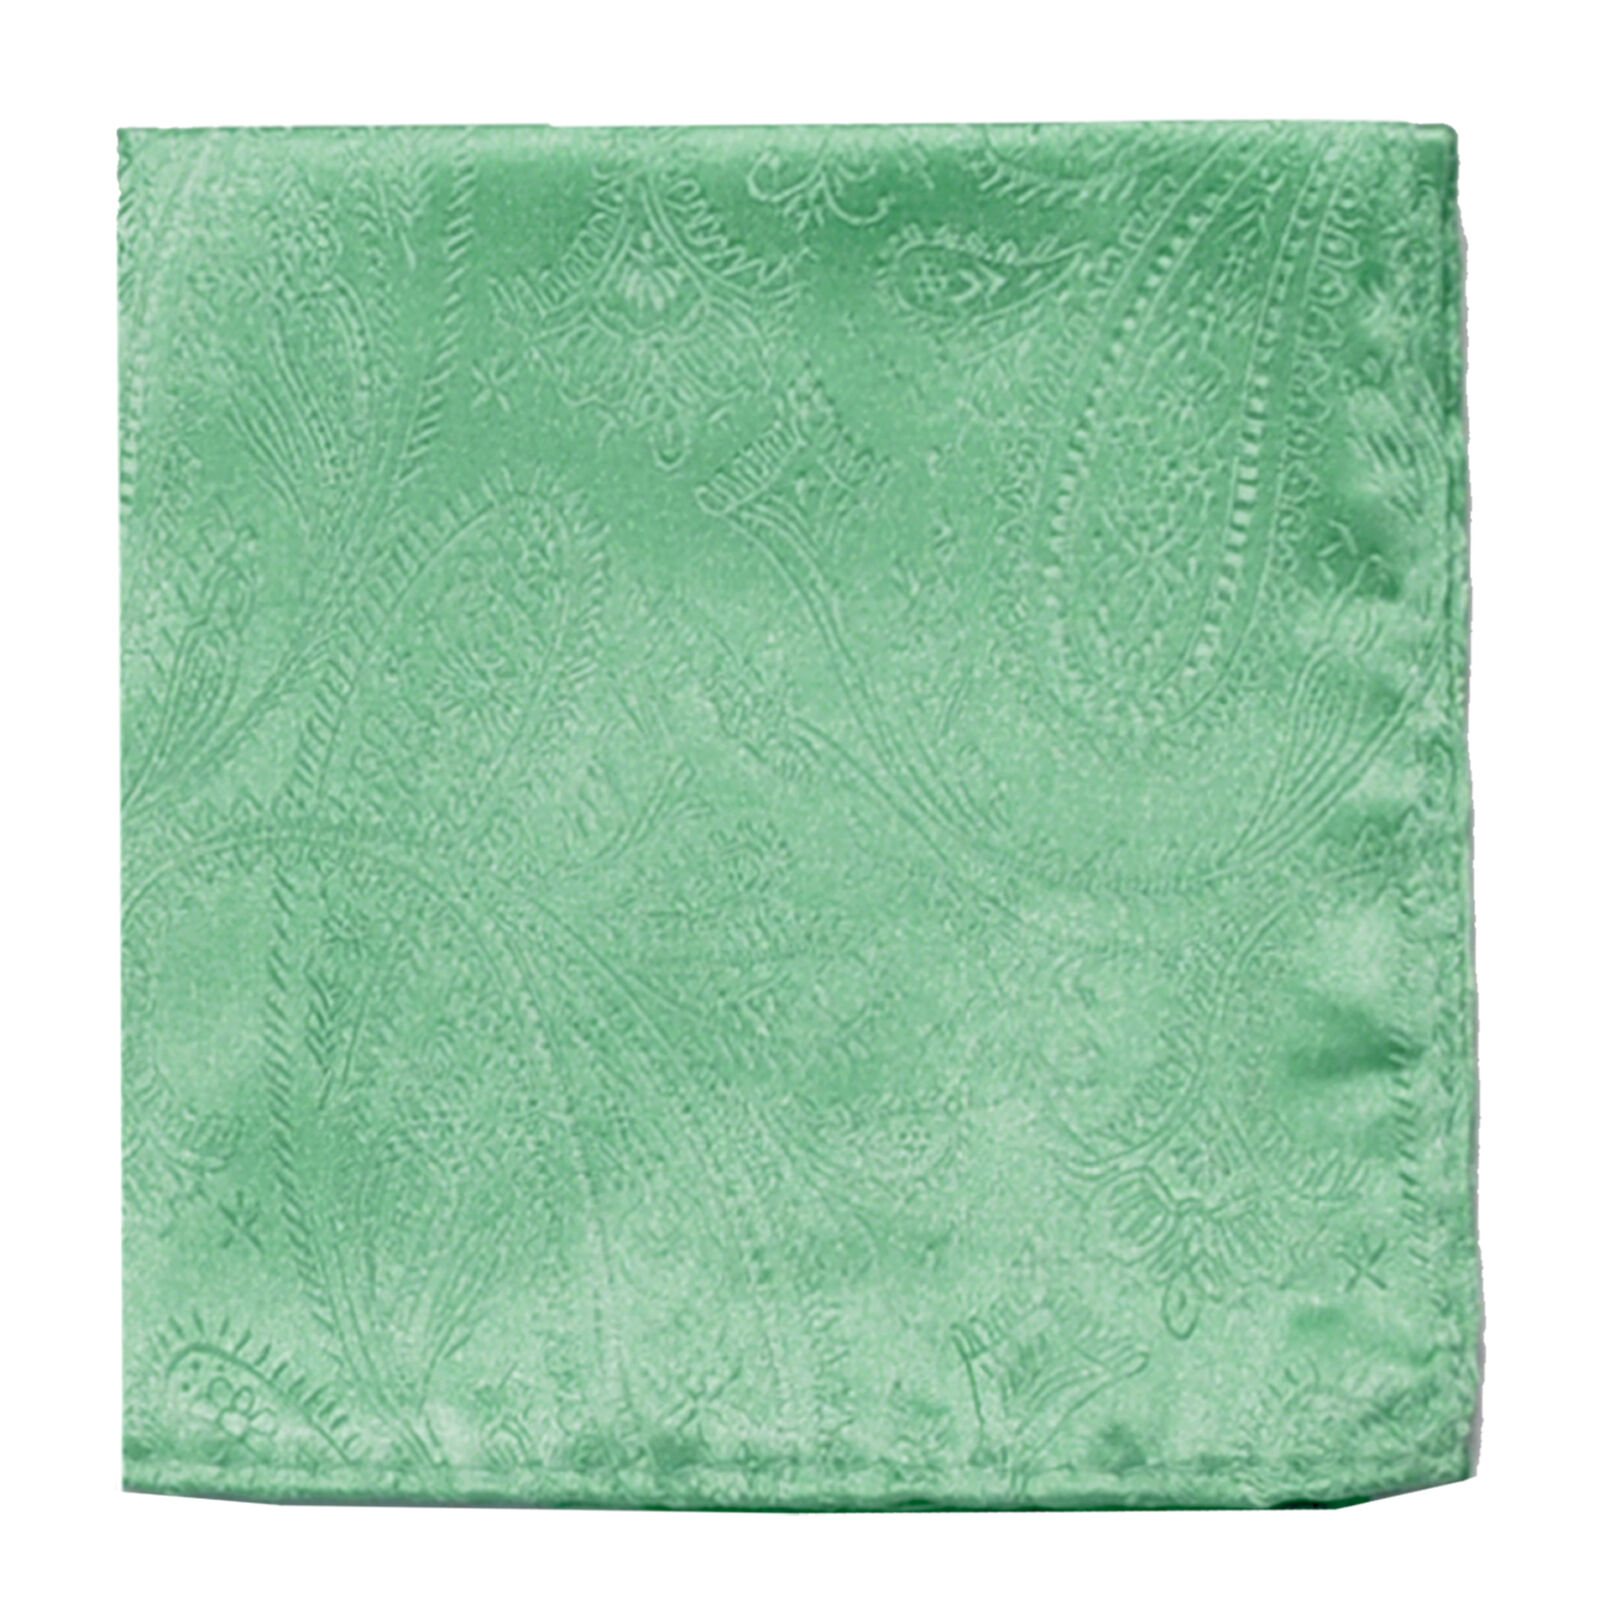 New men's polyester paisley aqua green hankie pocket square formal wedding prom